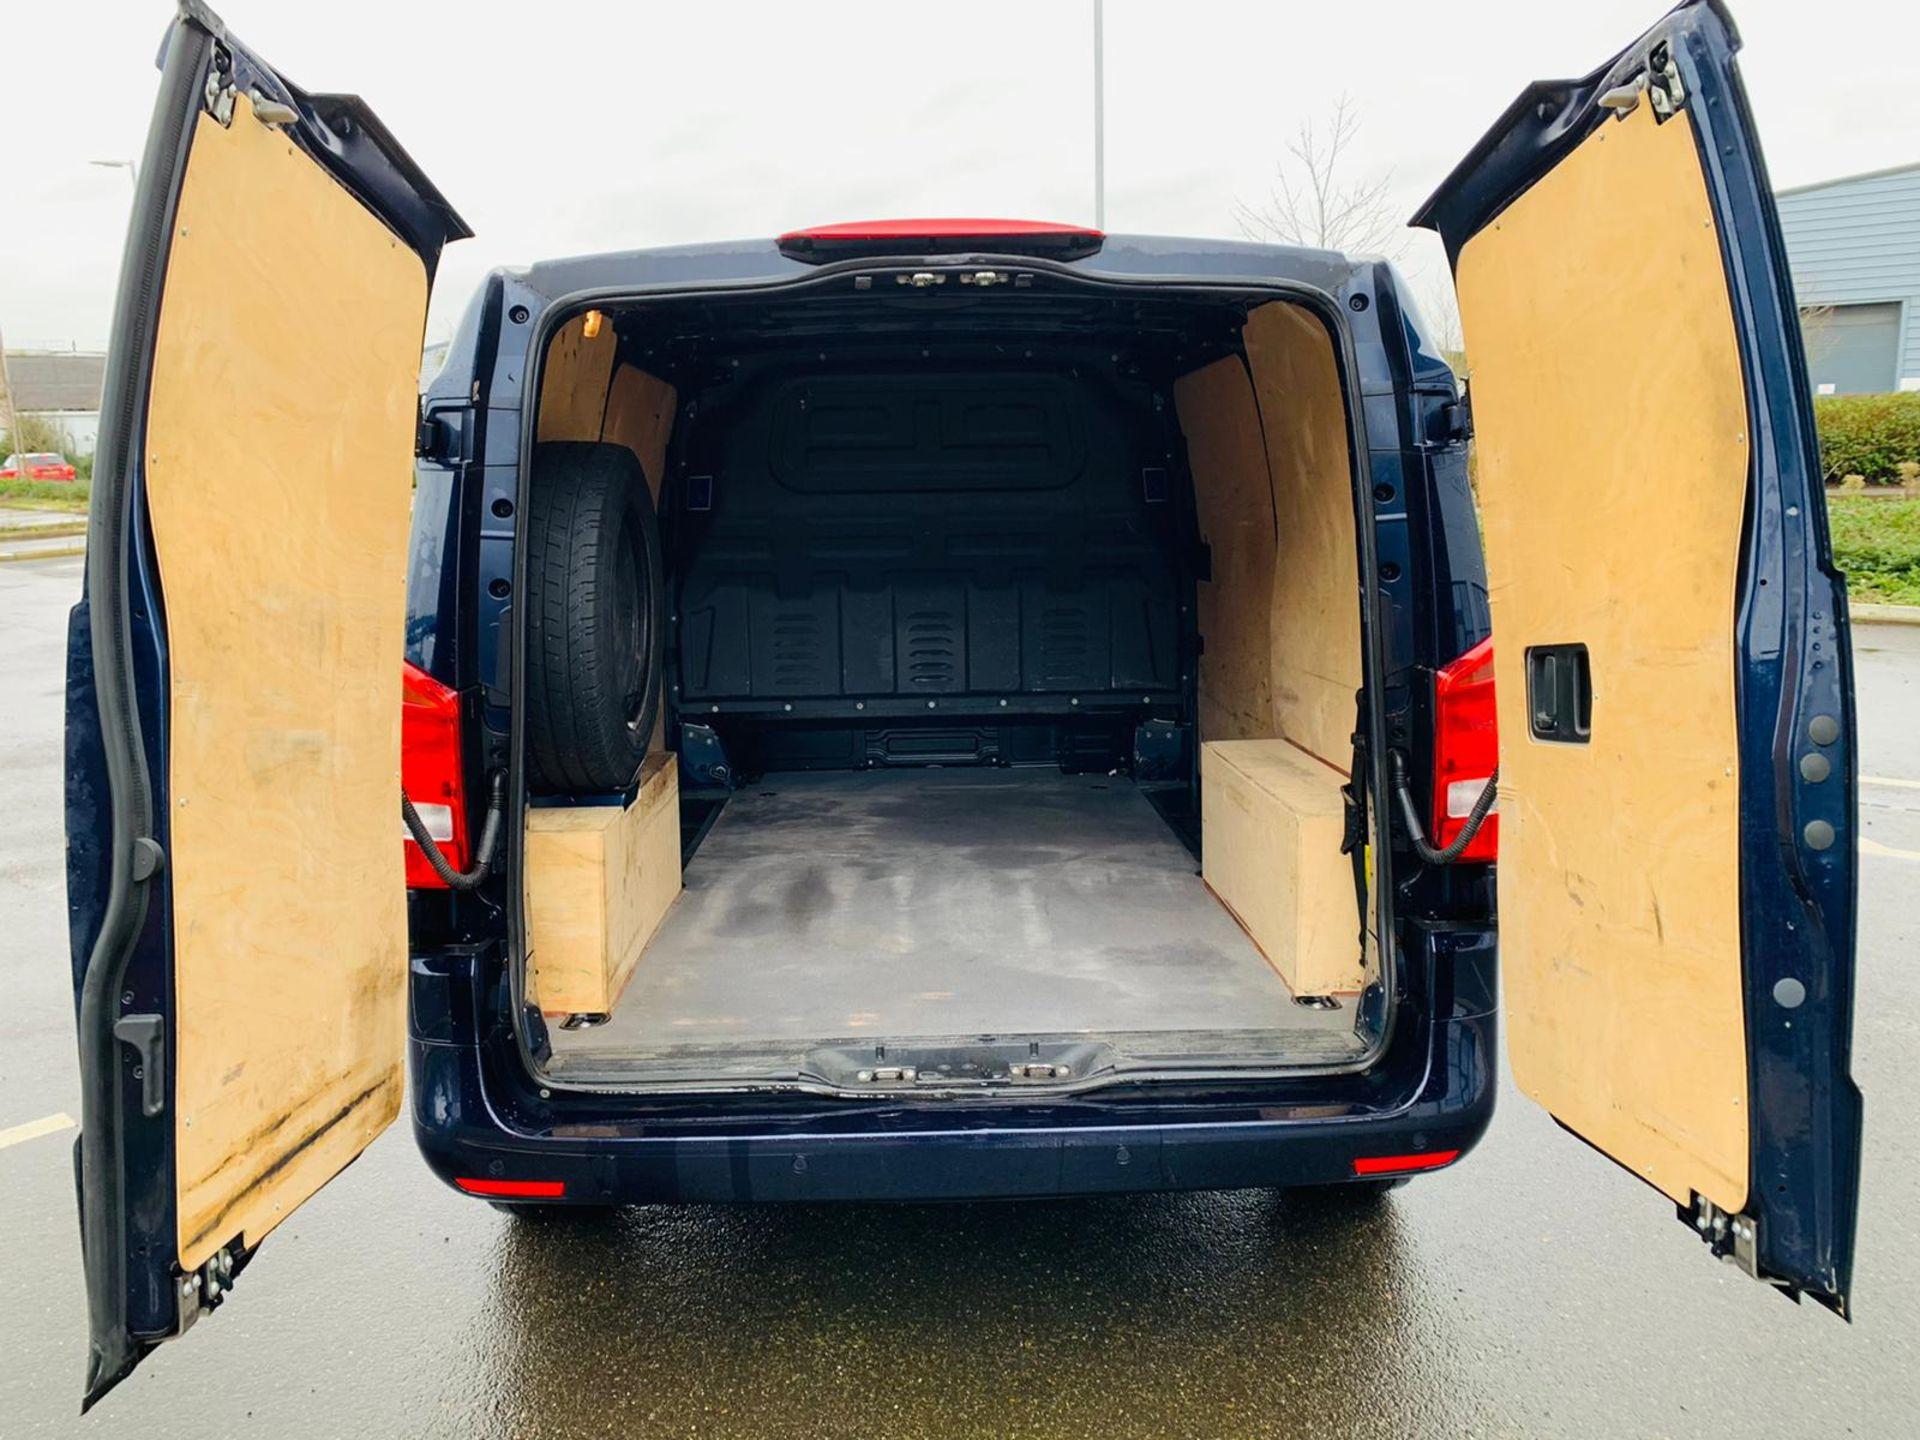 (RESERVE MET) Mercedes Vito 116Cdi Sporty Spec (161 BHP) Bluetech 6 Speed Van - 2016 Model - AC - Image 10 of 28